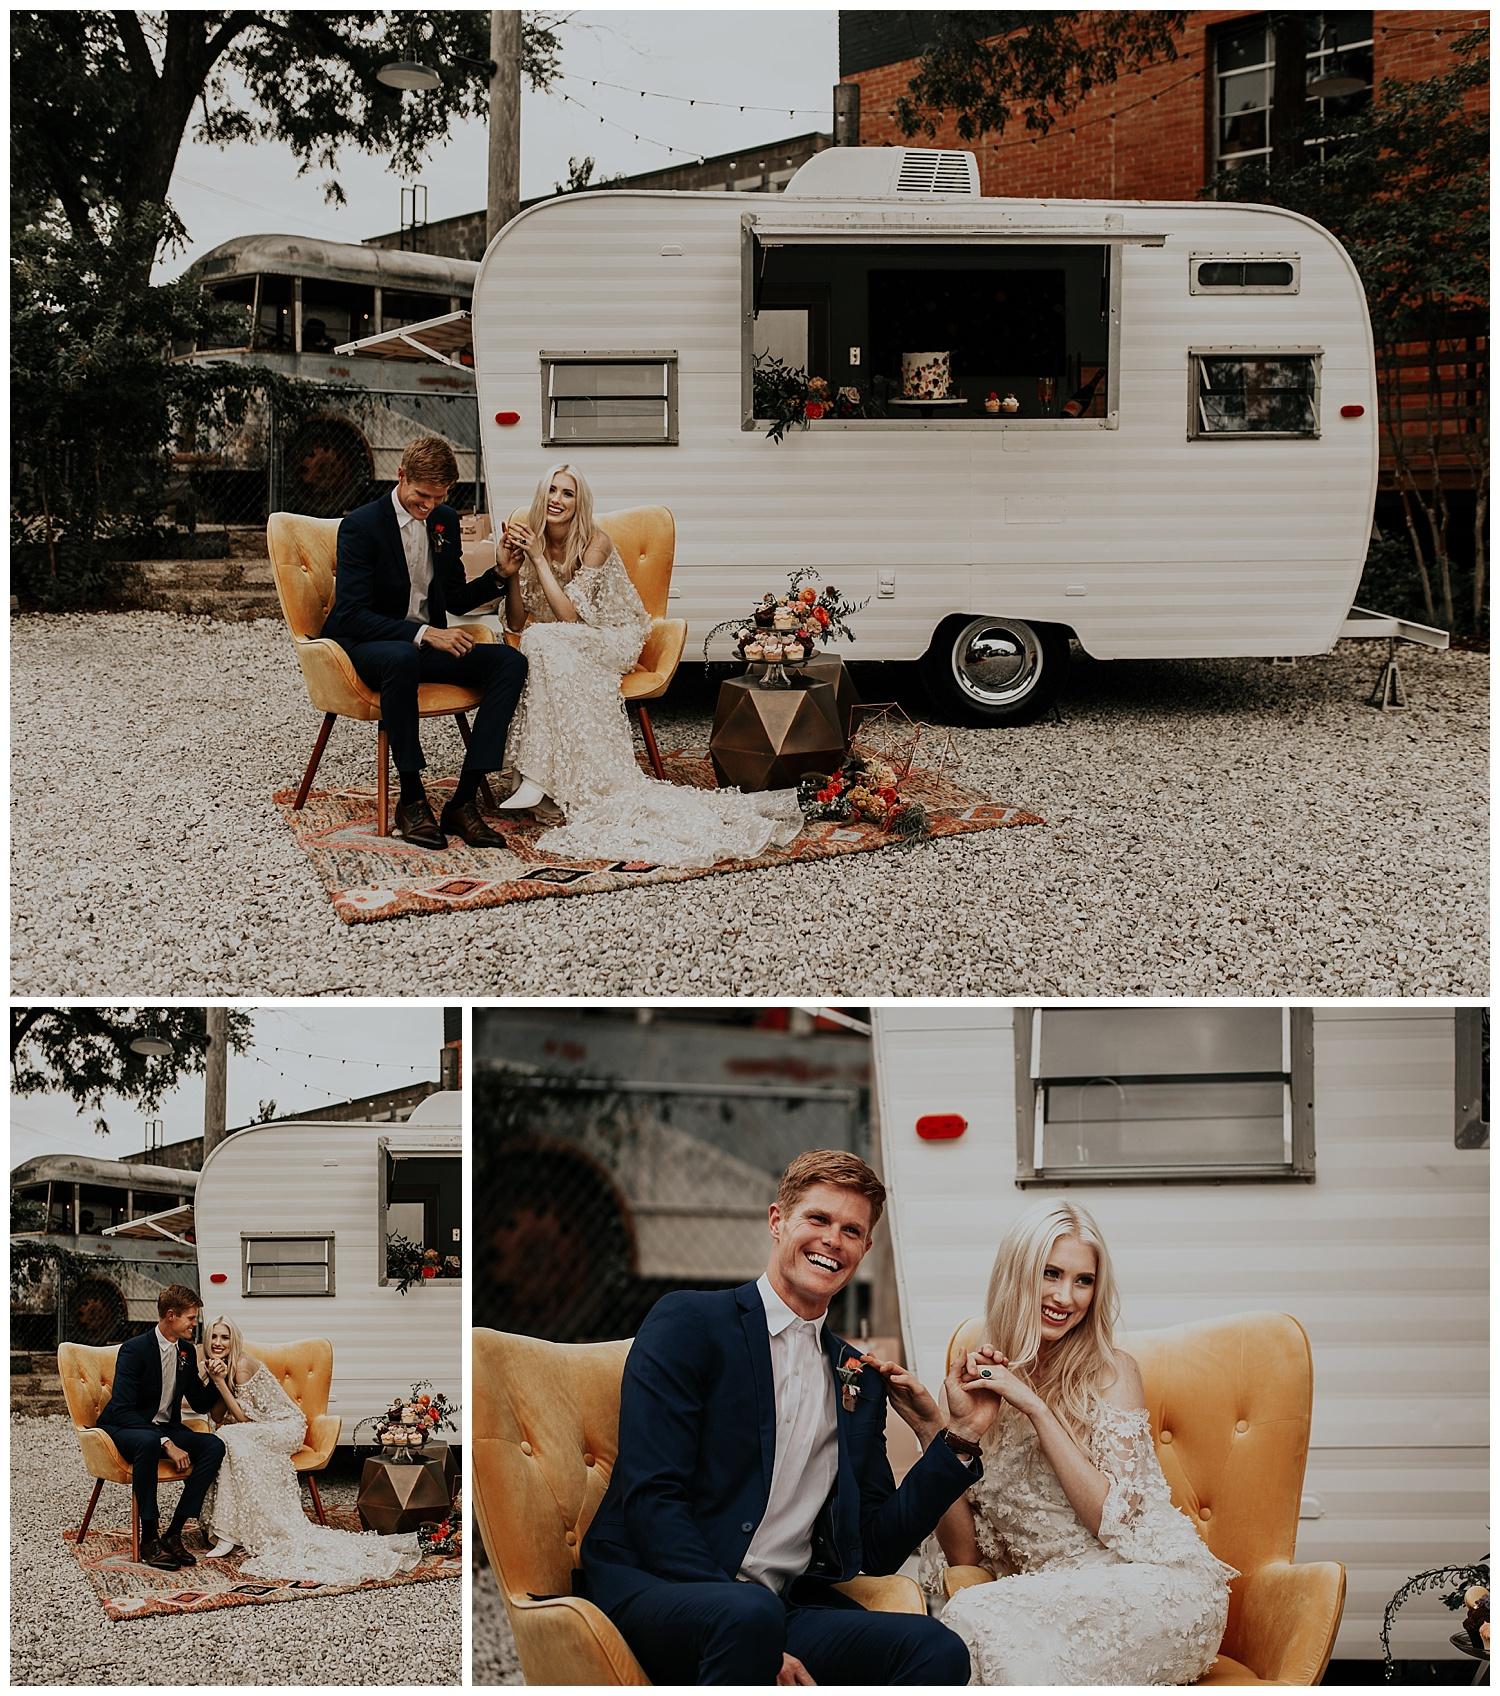 Laken-Mackenzie-Photography-Cliff-House-Dallas-Wedding-Photographer39.jpg